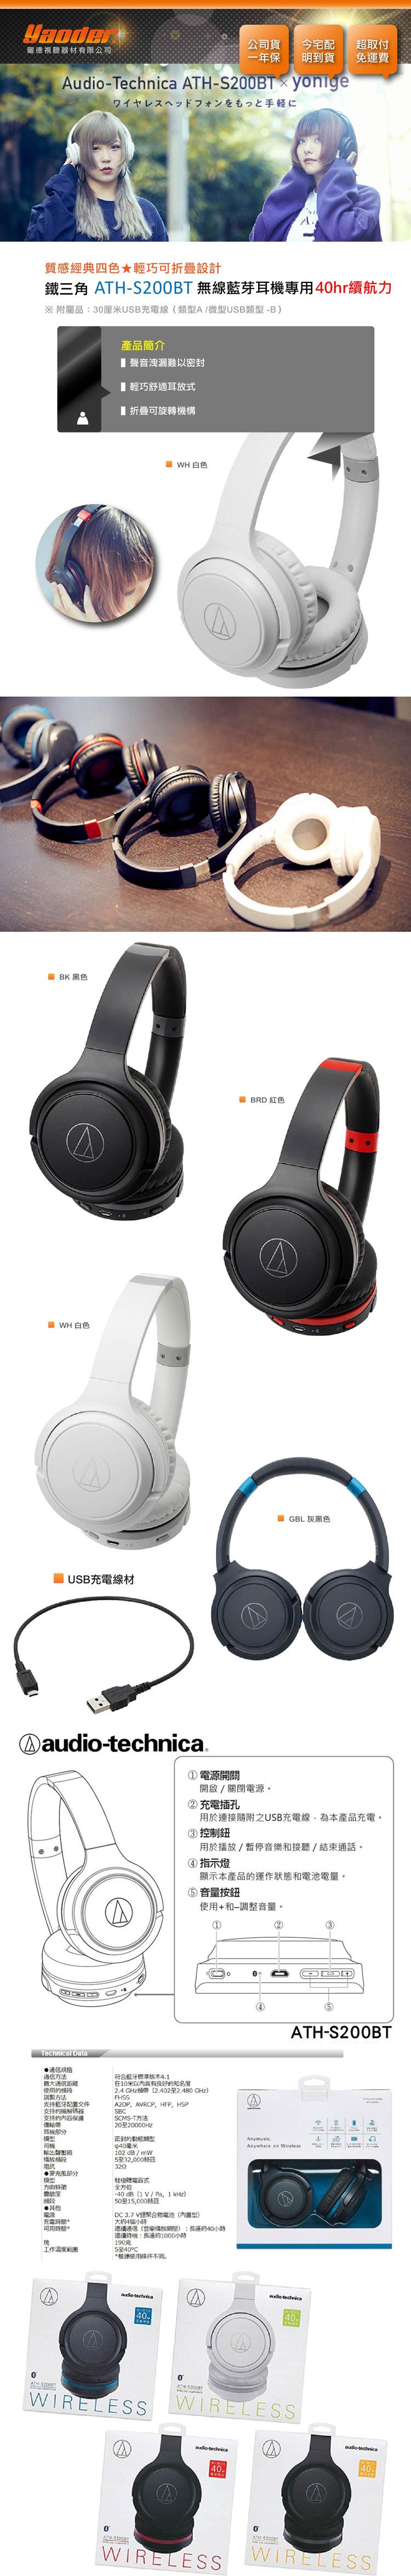 Ath S200bt Audio Technica S200 Bt Headphone On Ear Black Unable To Execute Javascript